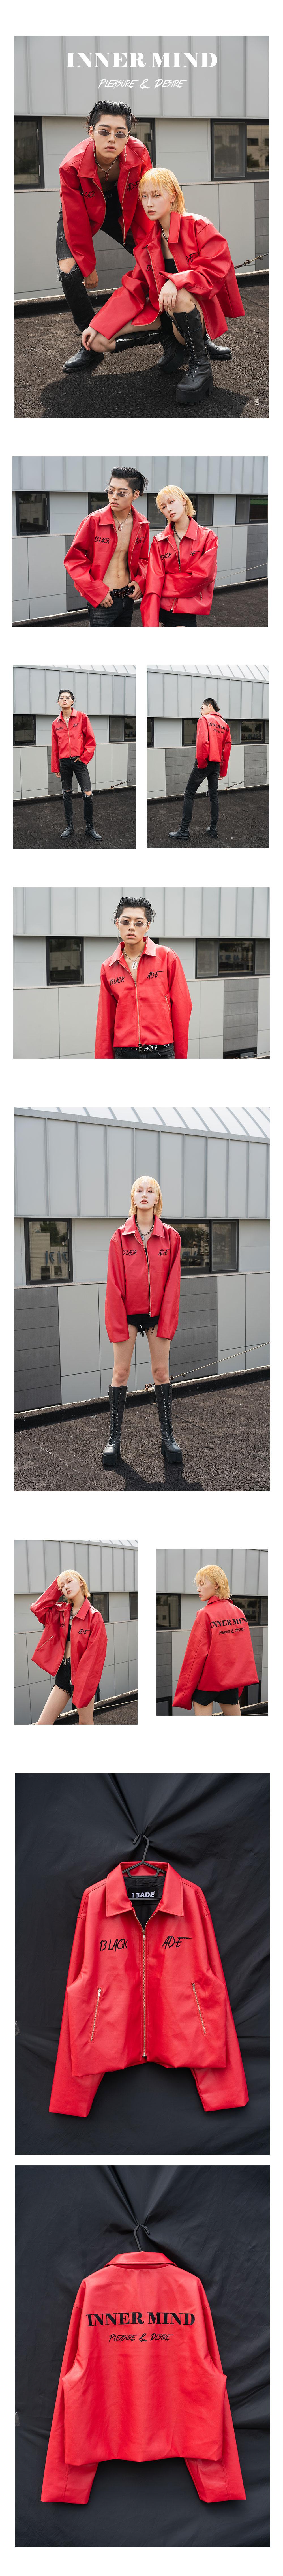 inner-mind-leather-jk-(red).jpg